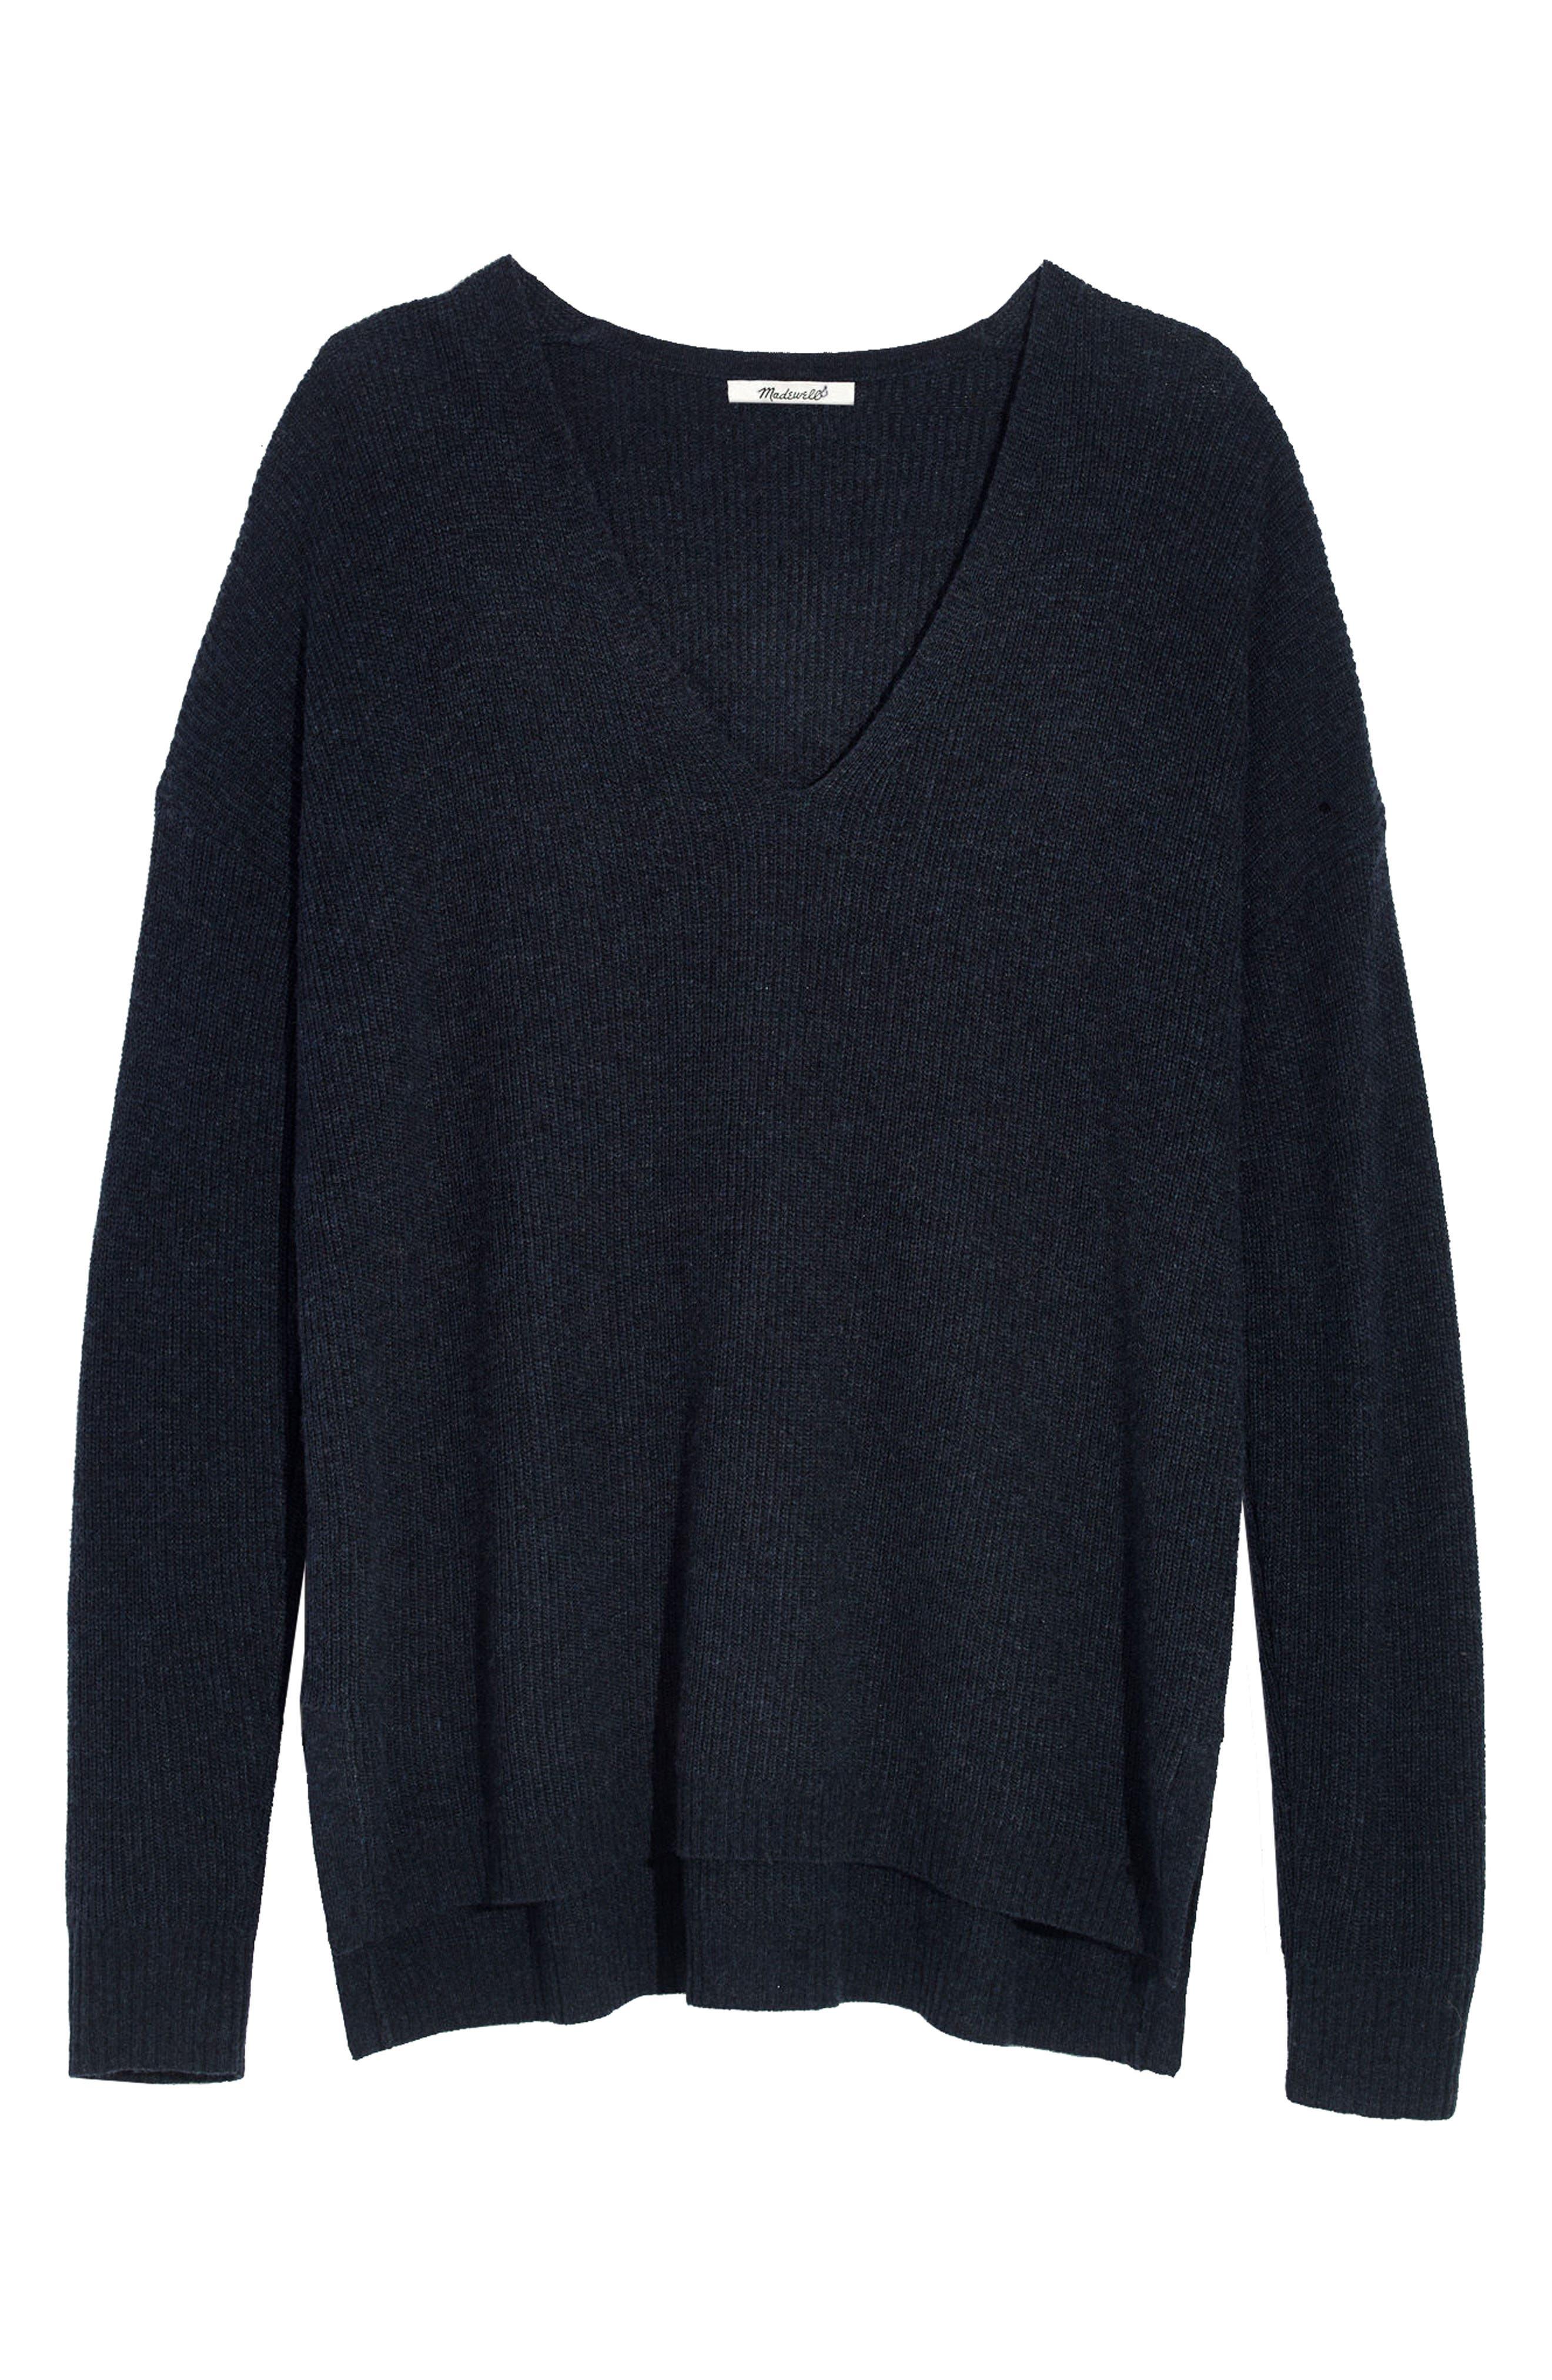 Warmlight V-Neck Sweater,                         Main,                         color, Heather Navy